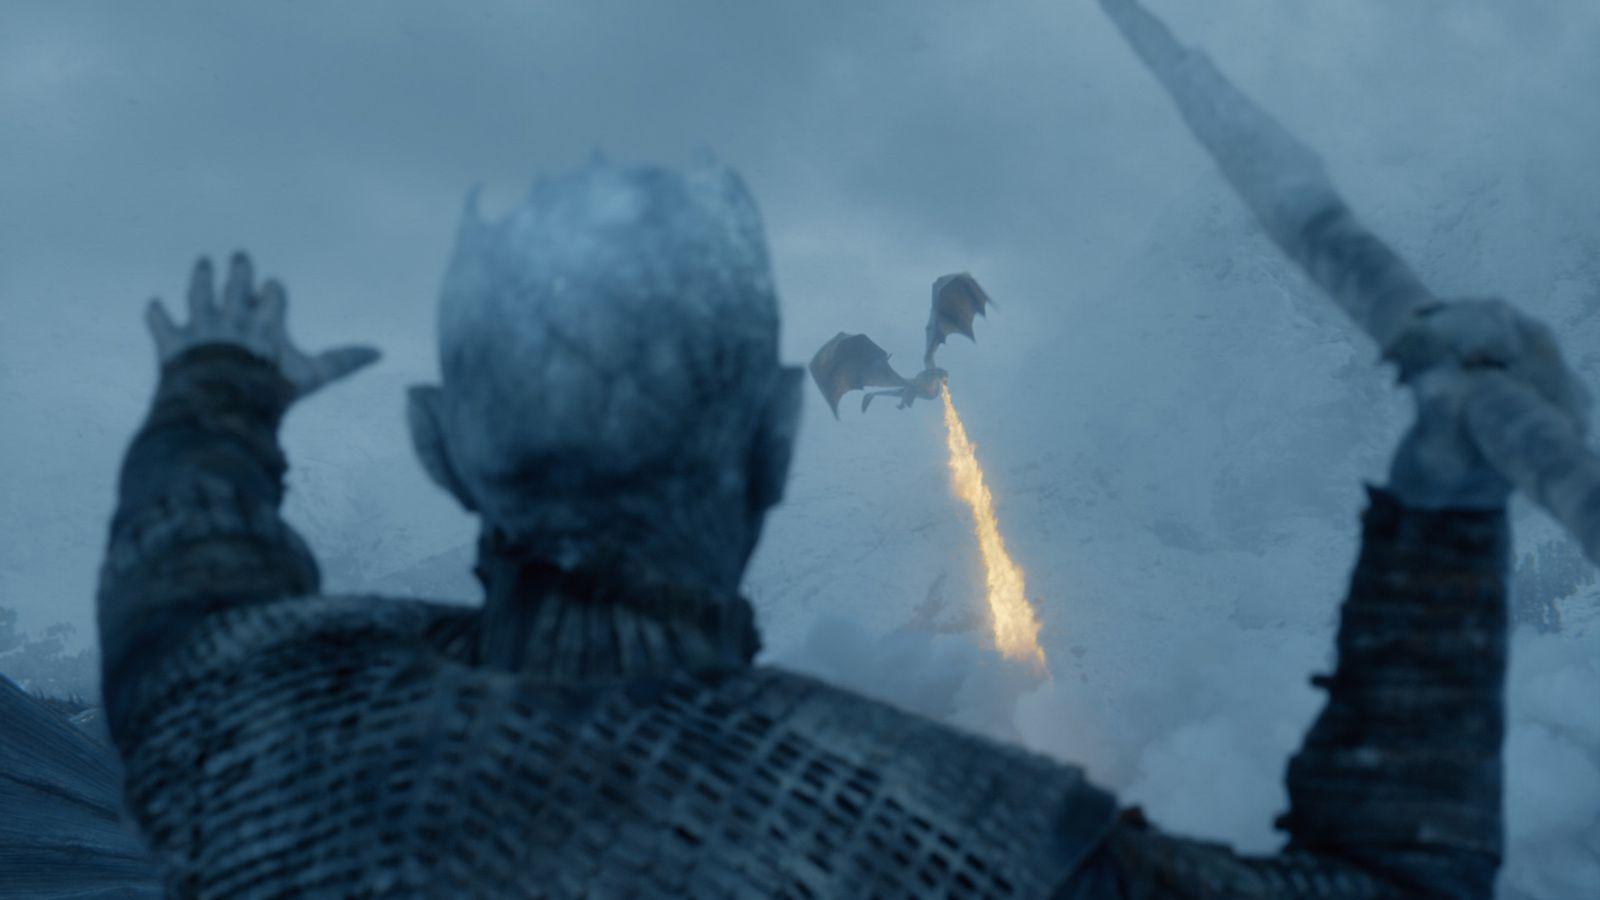 Game Of Thrones Season 7 Finale Broke Its Own Viewership Records Again Quartz